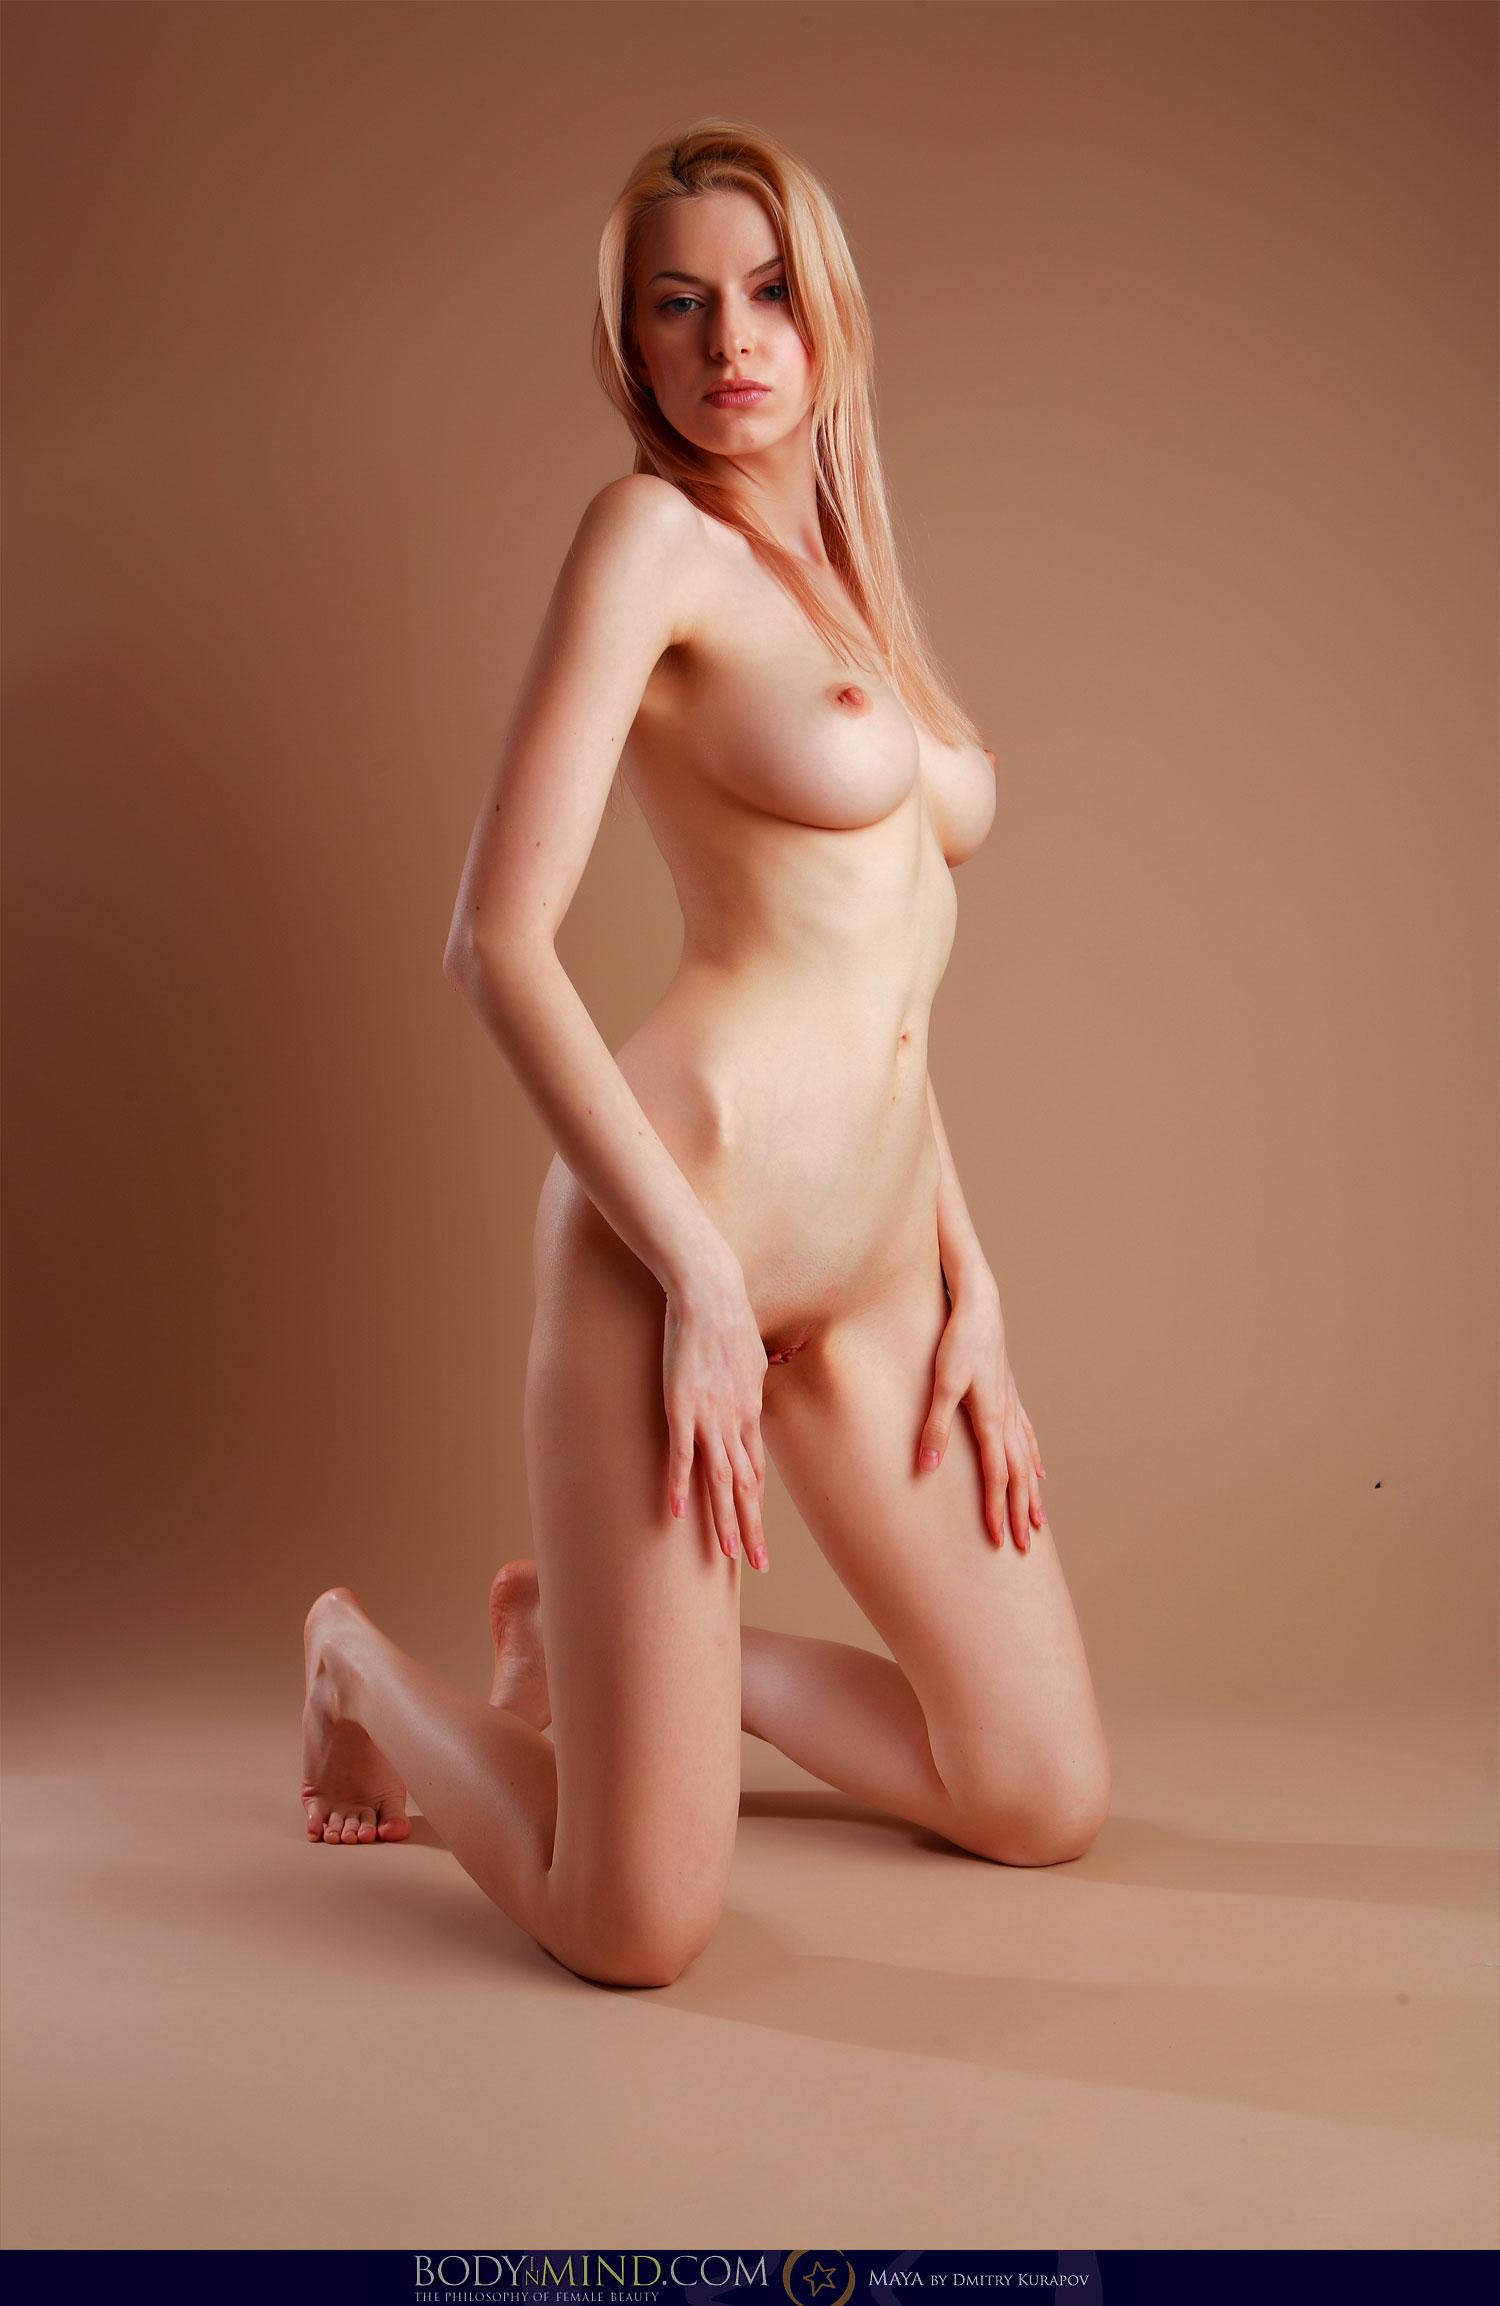 Mind nude models in body